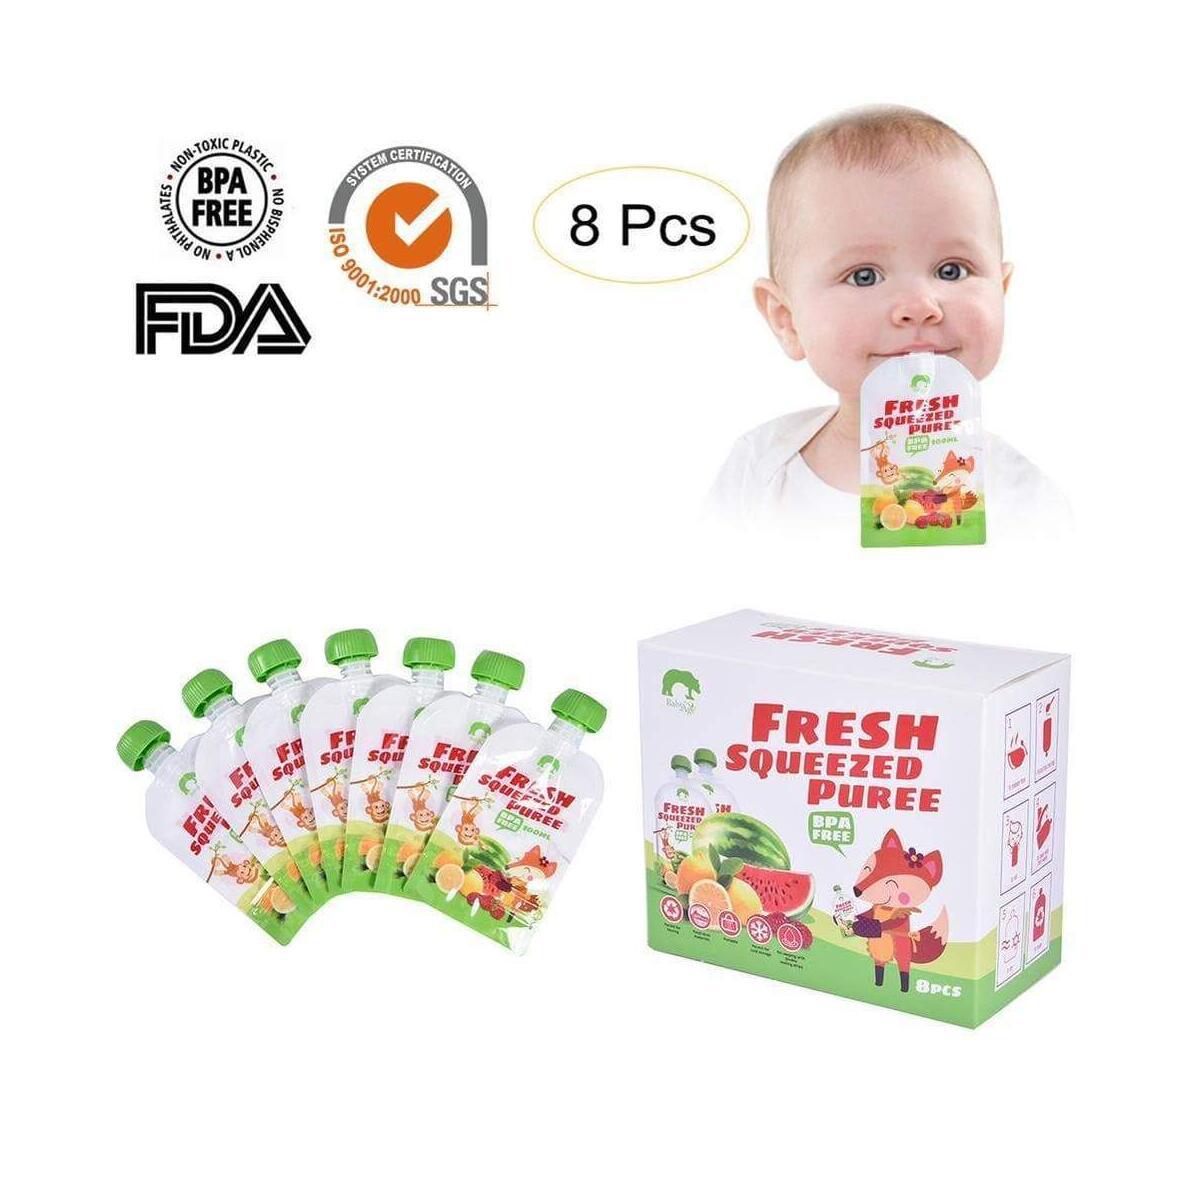 BPA Free Reusable Fresh Infant Double Zipper Food Pouches Animal 8 Pack Kids Storage Bag Breast Milk Bag Refillable Infant Feeding Bags